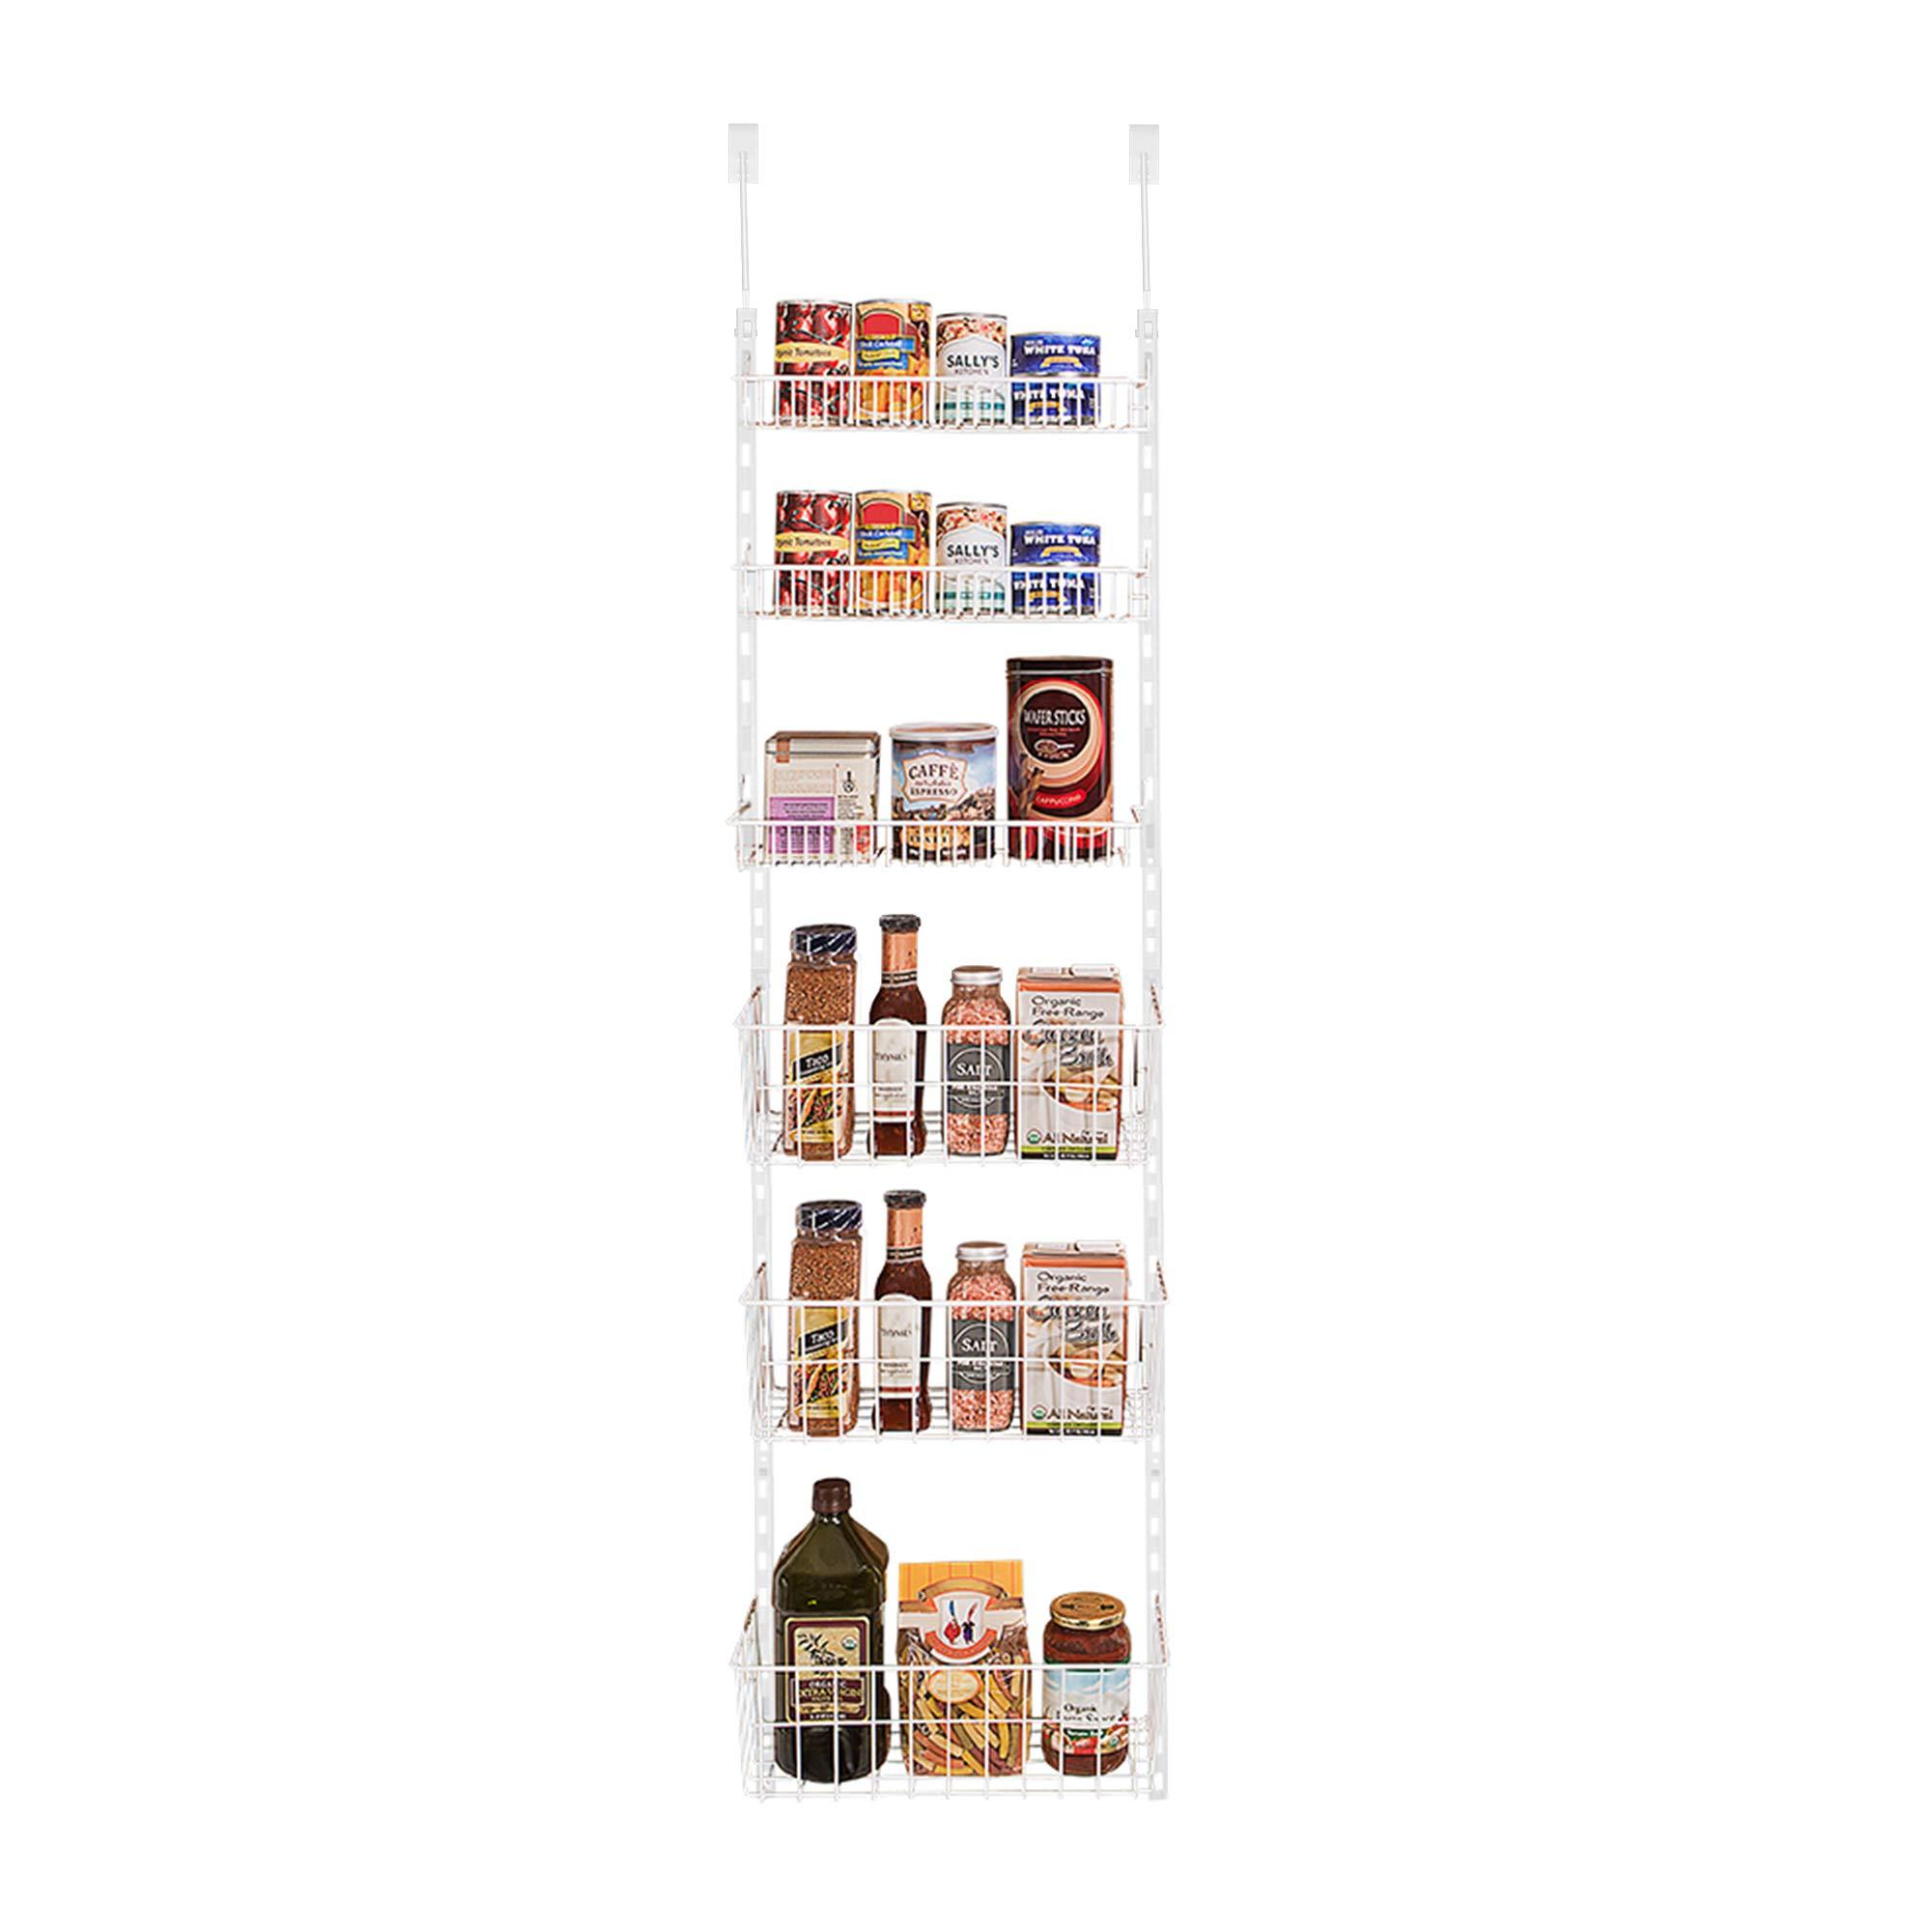 Smart Design Over The Door Adjustable Pantry Organizer Rack w/ 6 Adjustable Shelves - PE Dip - Steel Metal Construction w/Hooks & Screws - Cans, Food, Misc. Item - Kitchen (17 x 55.25 Inch) [White]